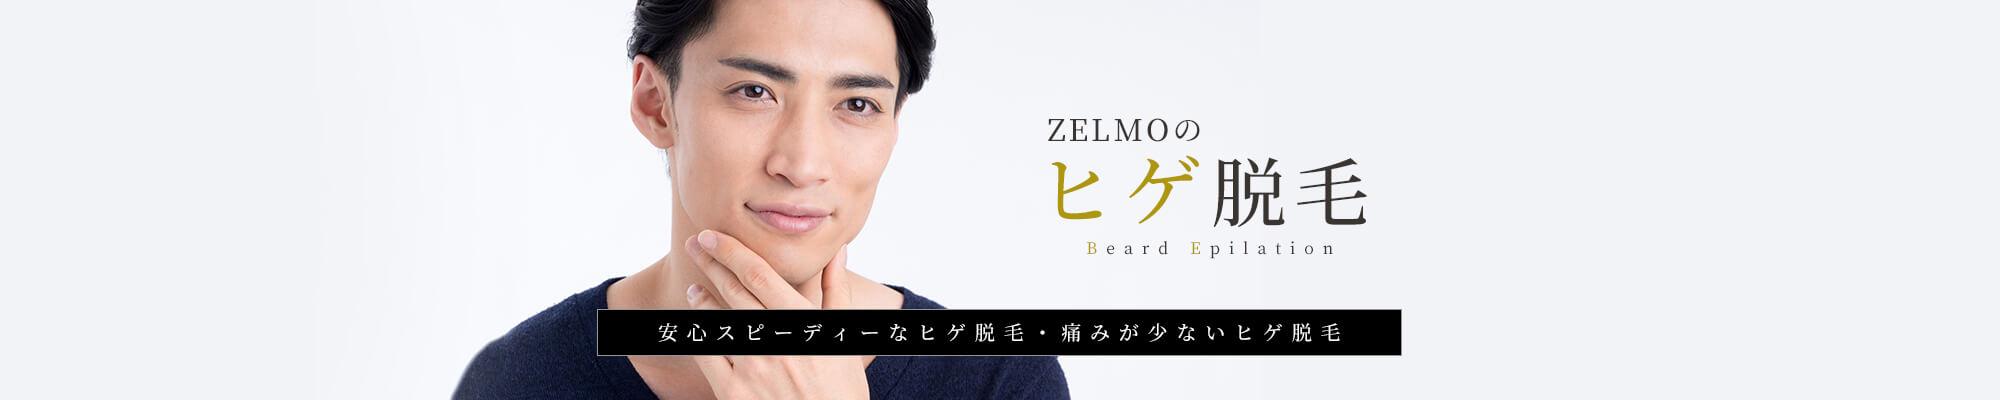 ZELMOのヒゲ脱毛 安心スピーディーなヒゲ脱毛・痛みが少ないヒゲ脱毛